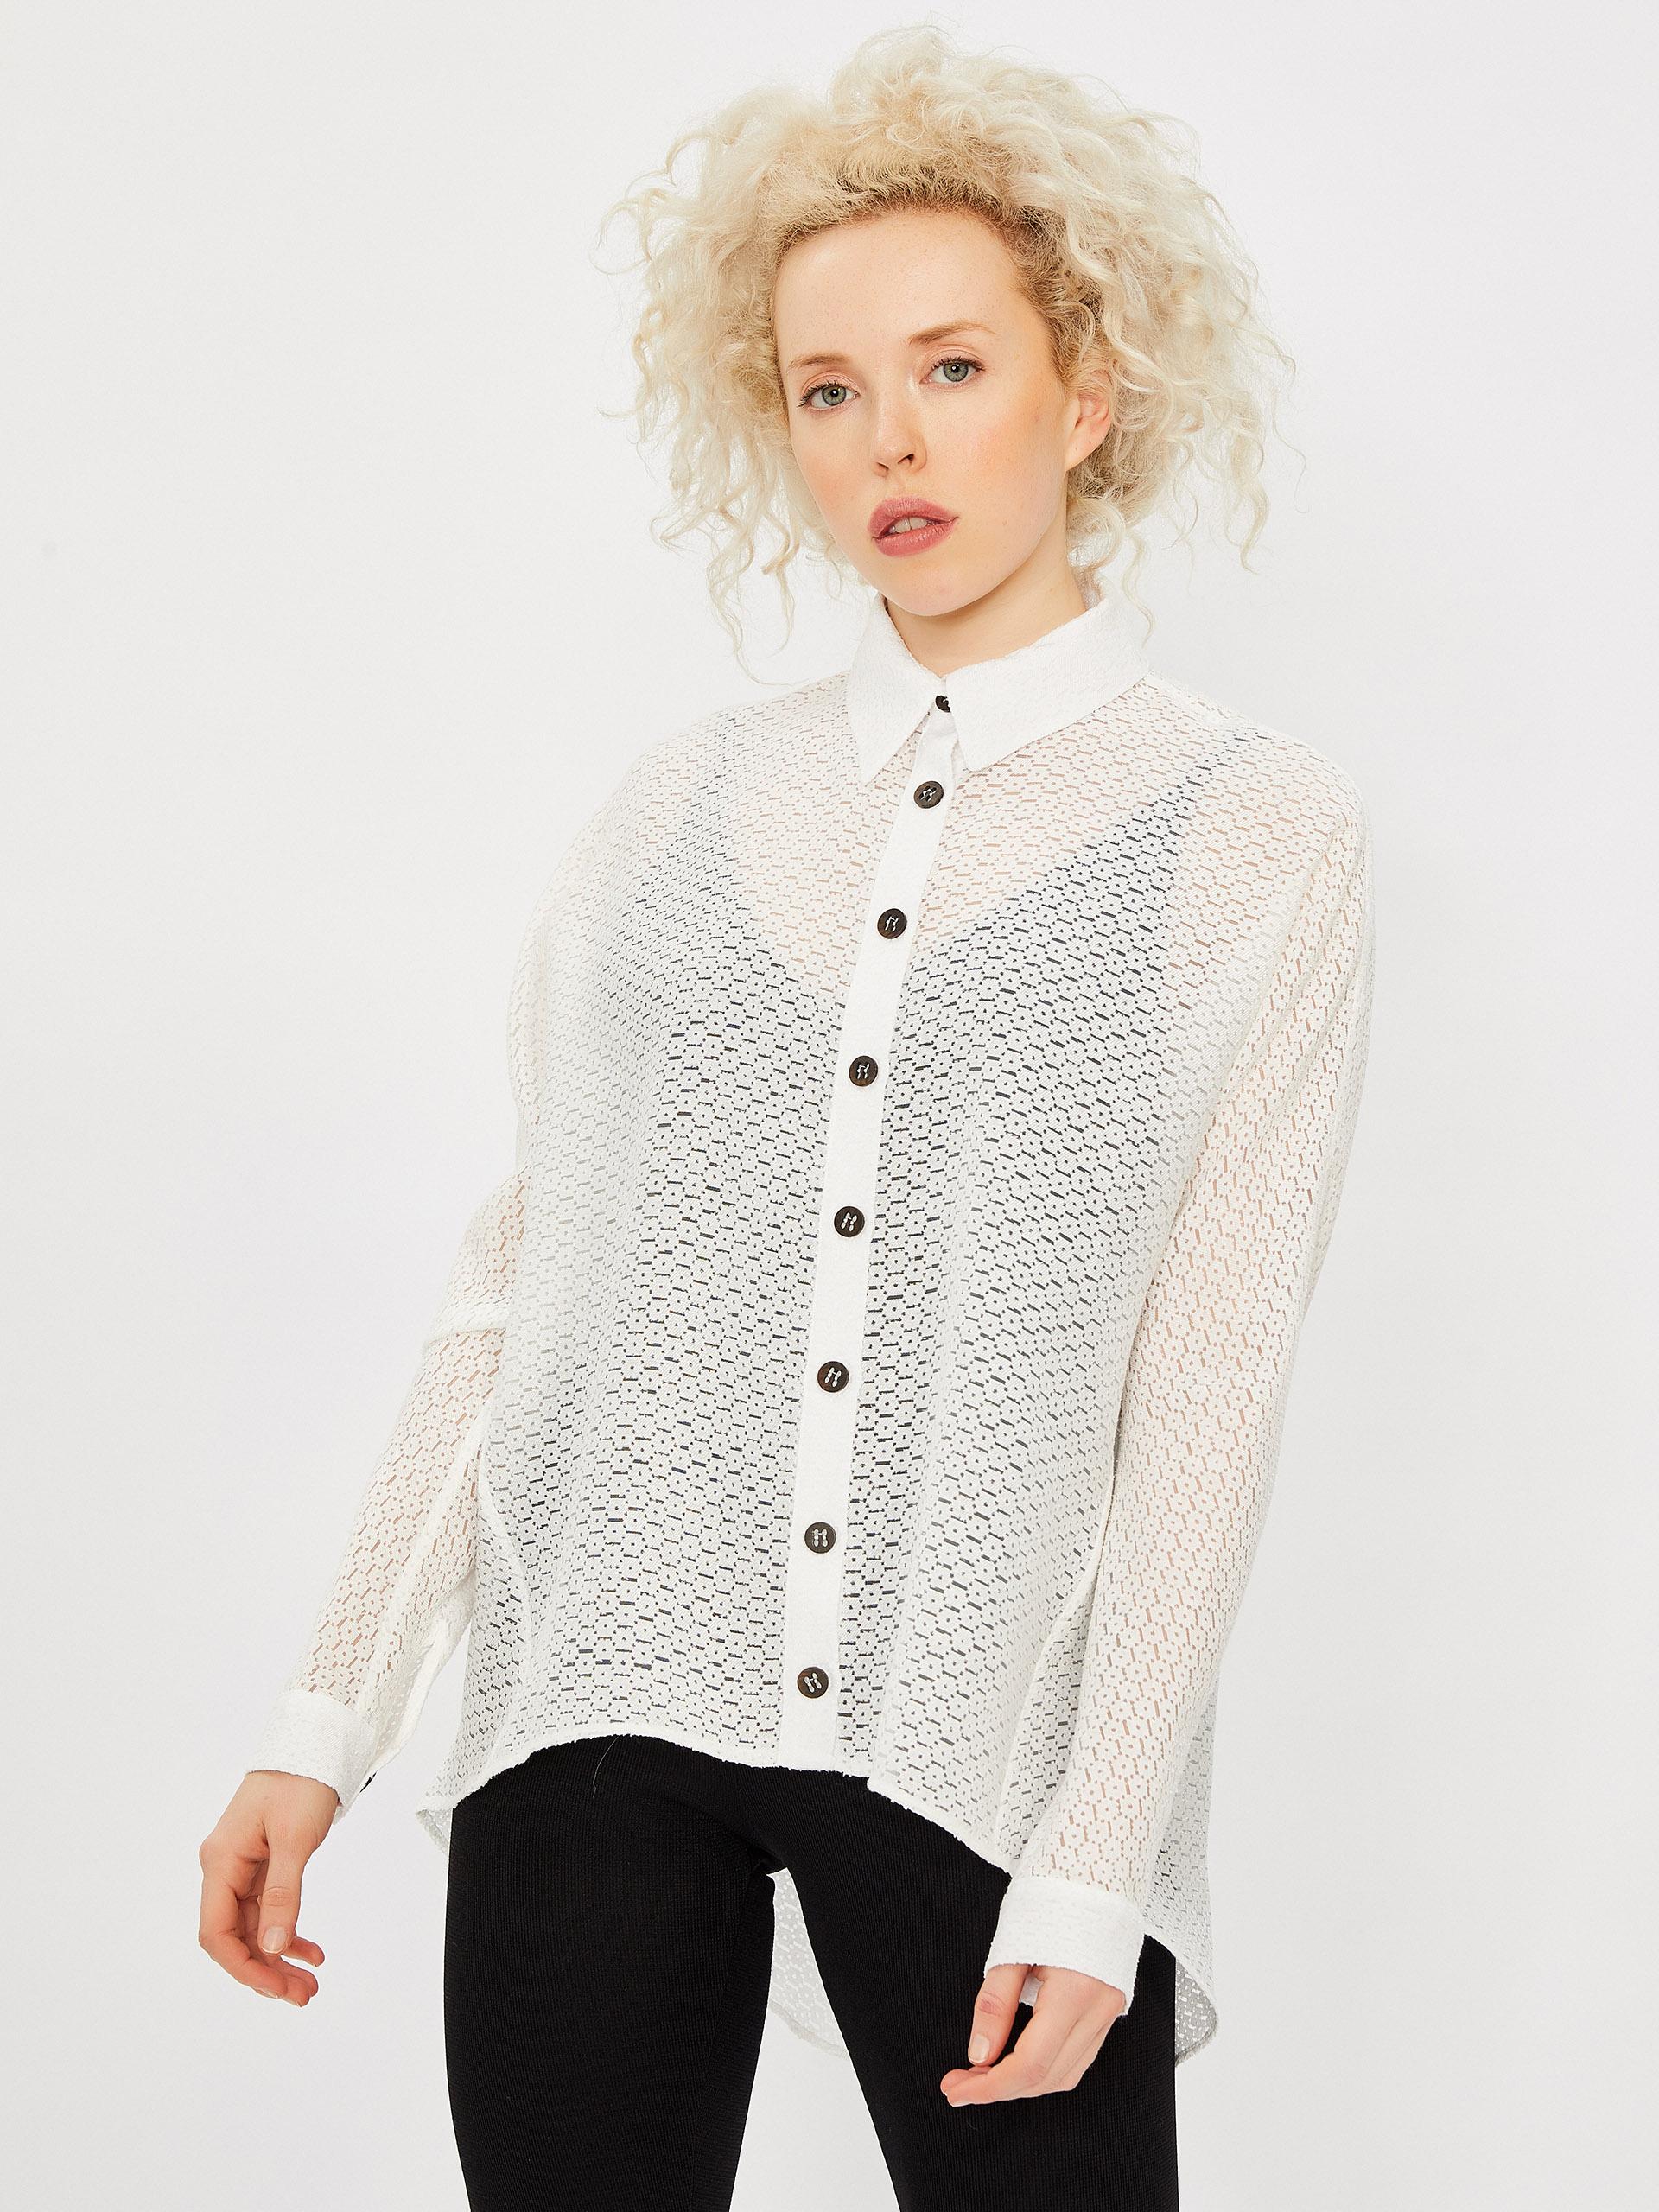 Asymmetric Cut Shirt